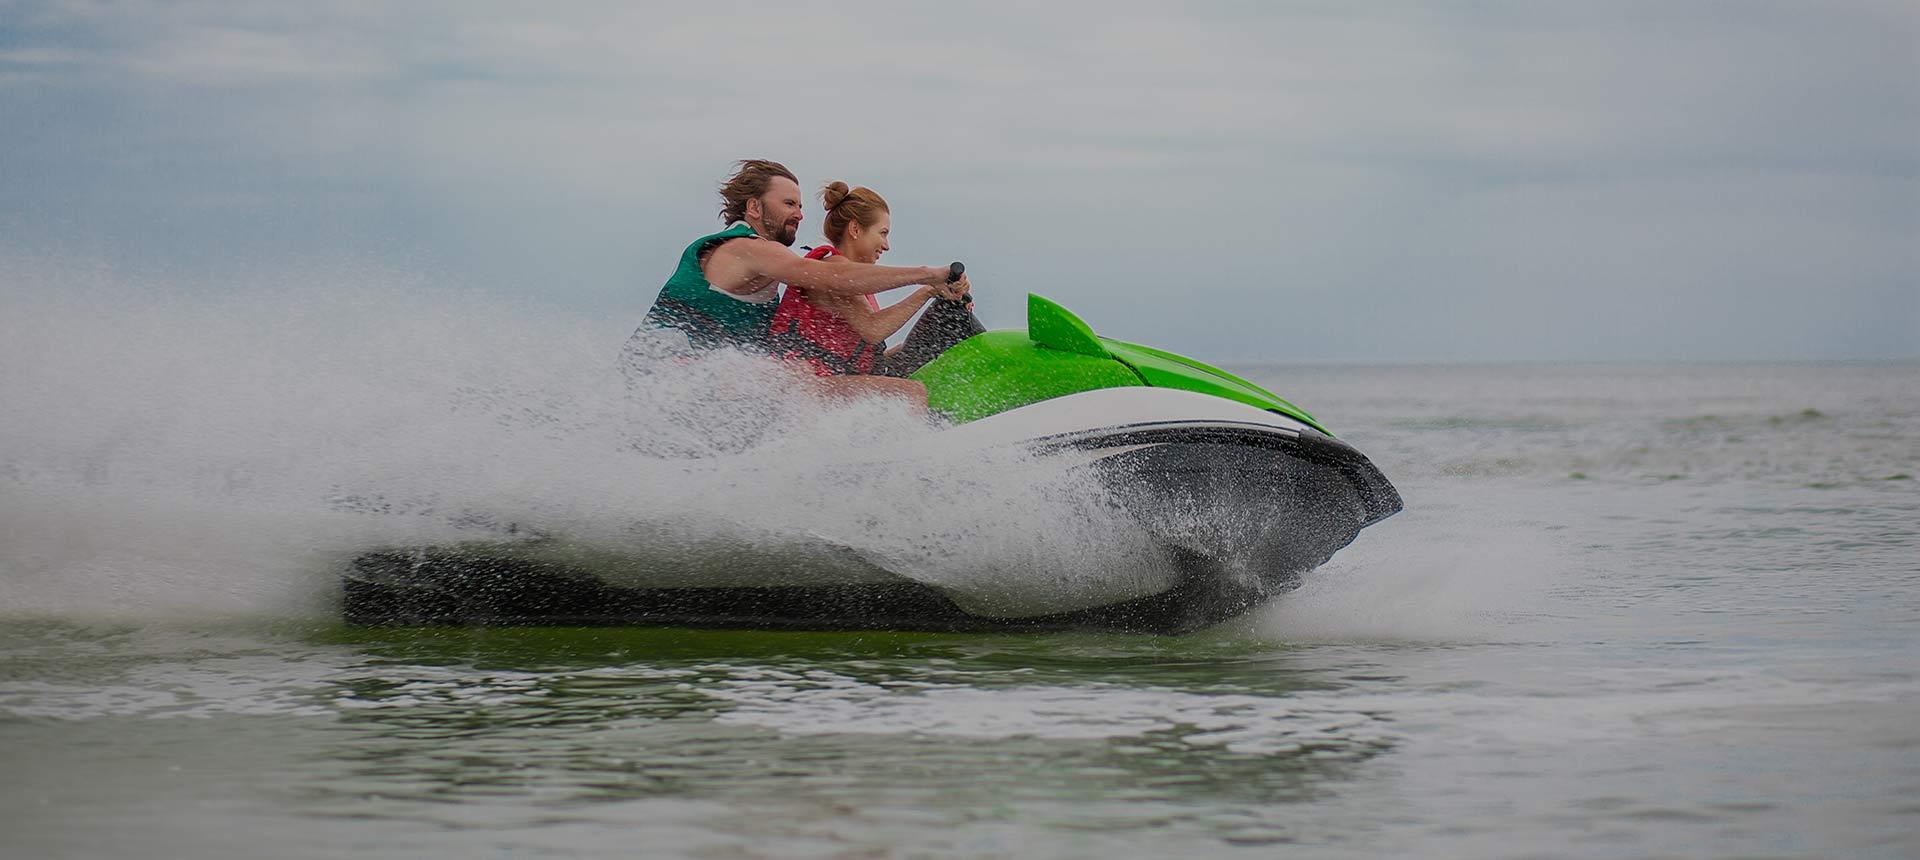 water scooter zante